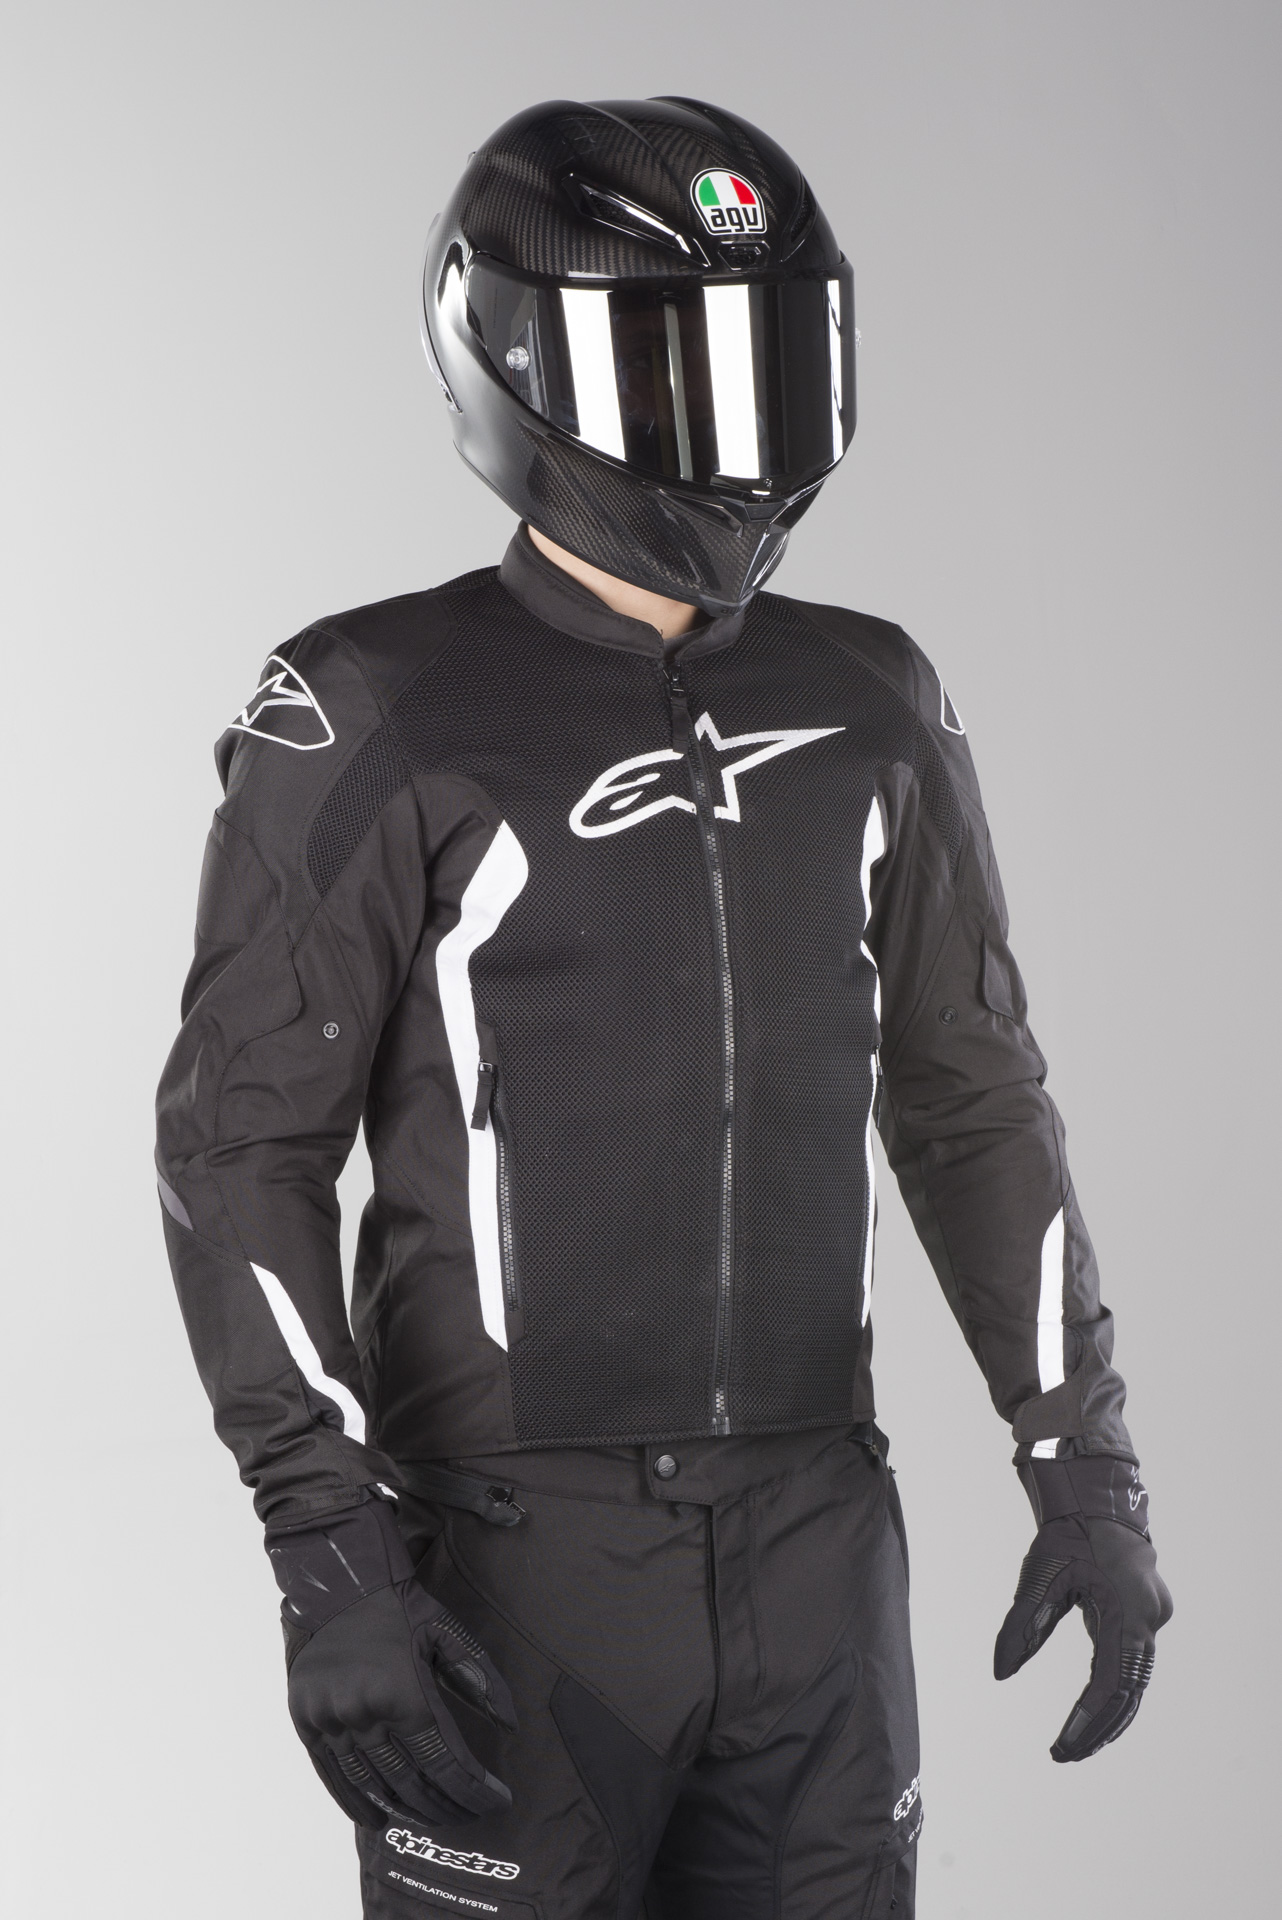 Alpinestars Viper V2 Air Textile Jacket